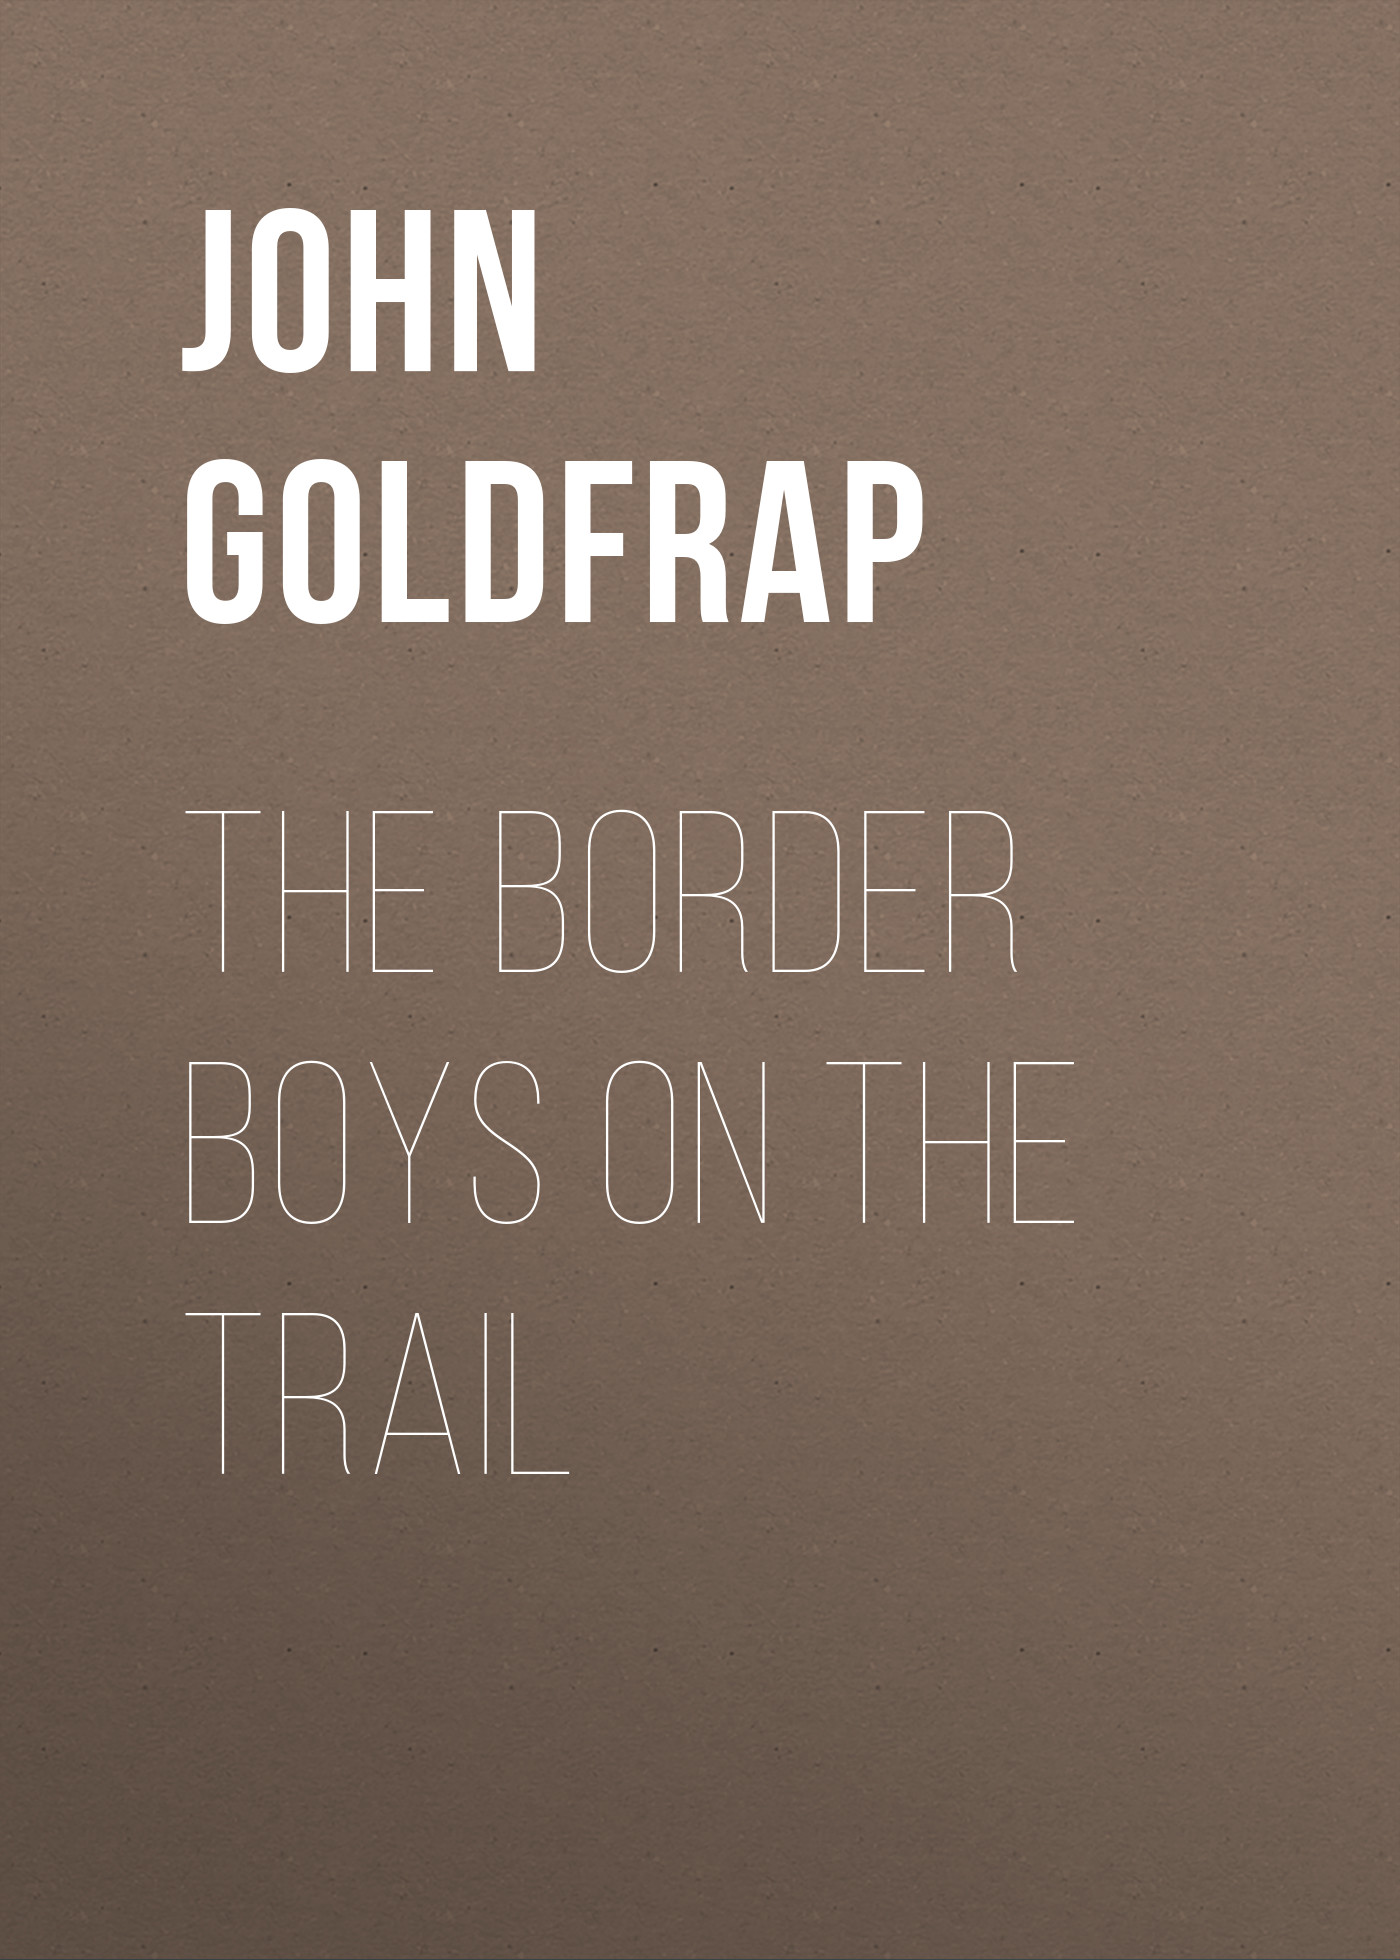 Goldfrap John Henry The Border Boys on the Trail goldfrap john henry the bungalow boys along the yukon